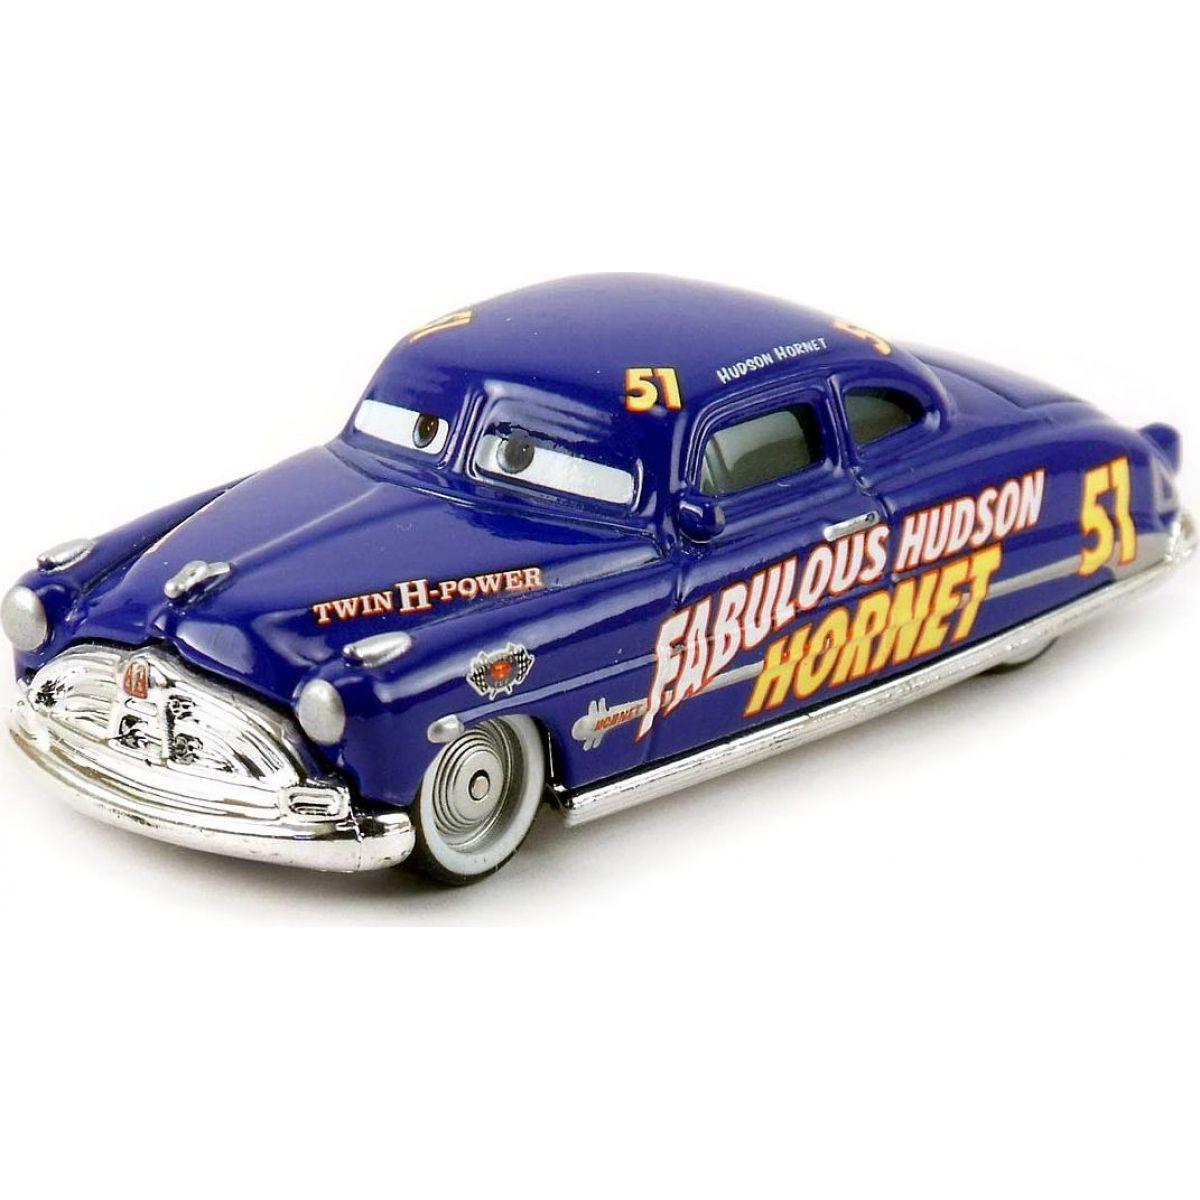 Cars 2 Auta Mattel W1938 - Báječný doktor Hudson